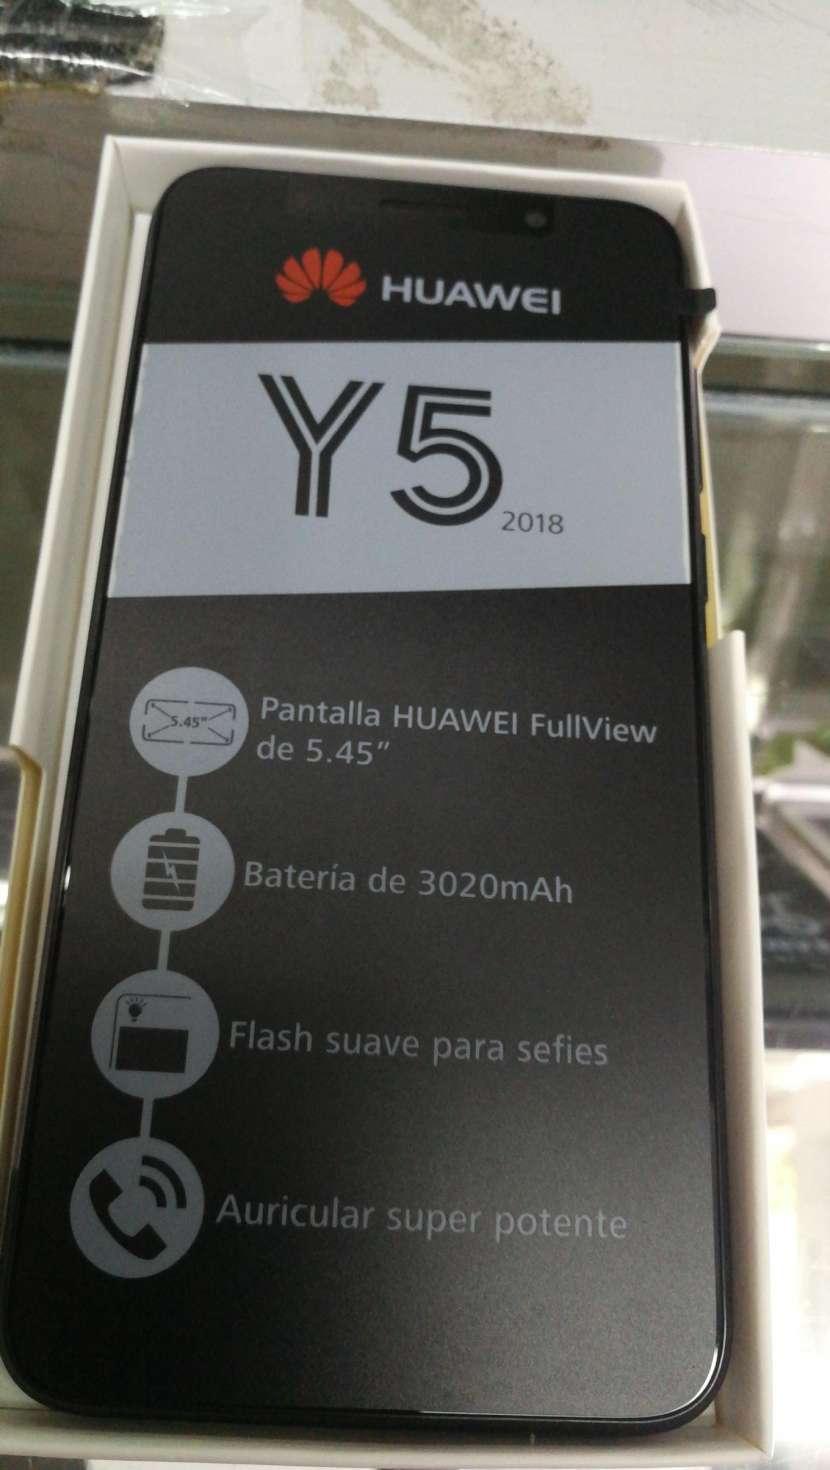 Huawei Y5 2018 financiado - 0